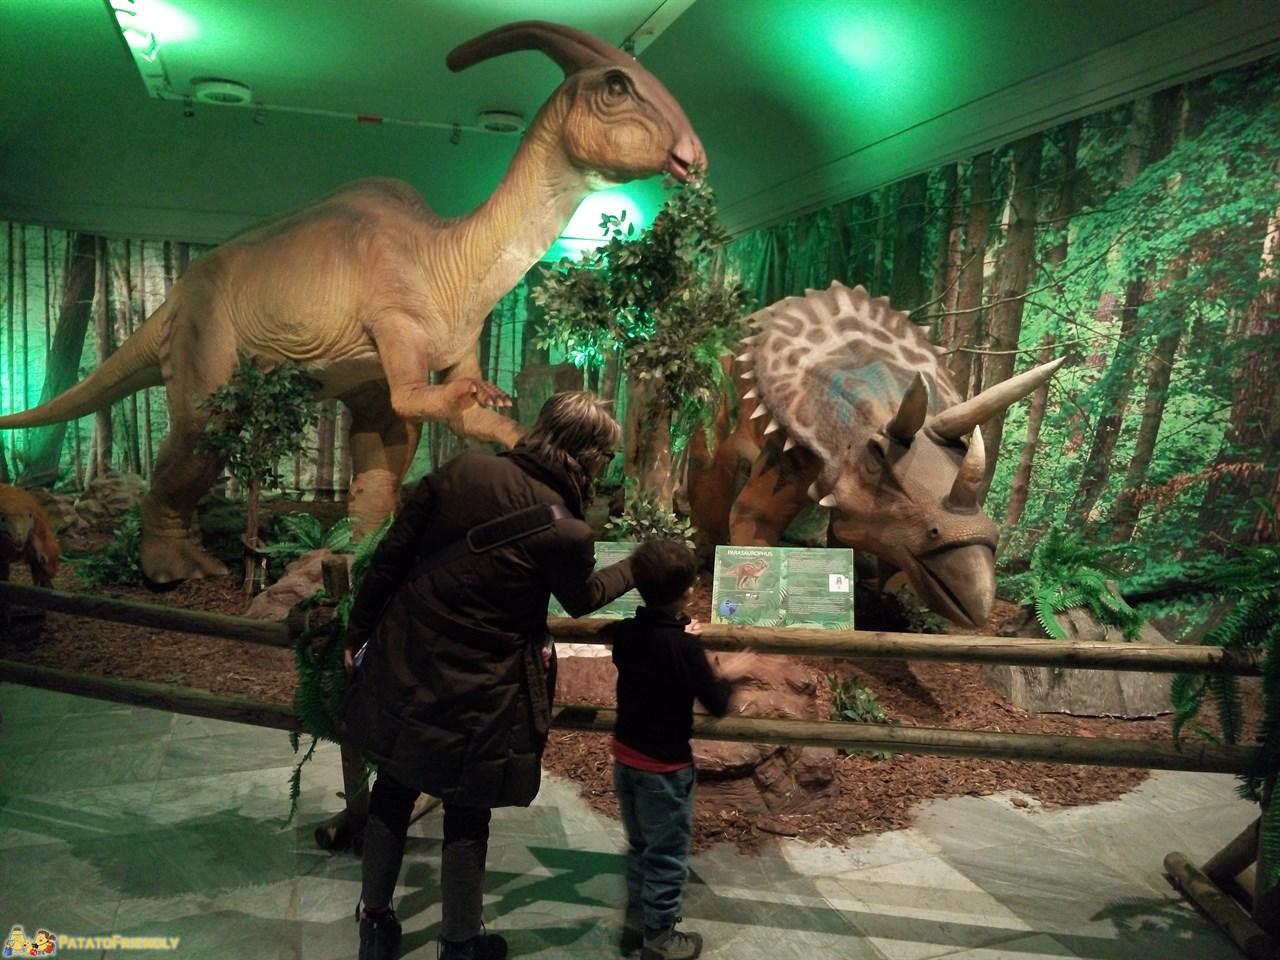 [cml_media_alt id='9544']Dinosaurs Live - La mostra dei dinosauri a Torino[/cml_media_alt]